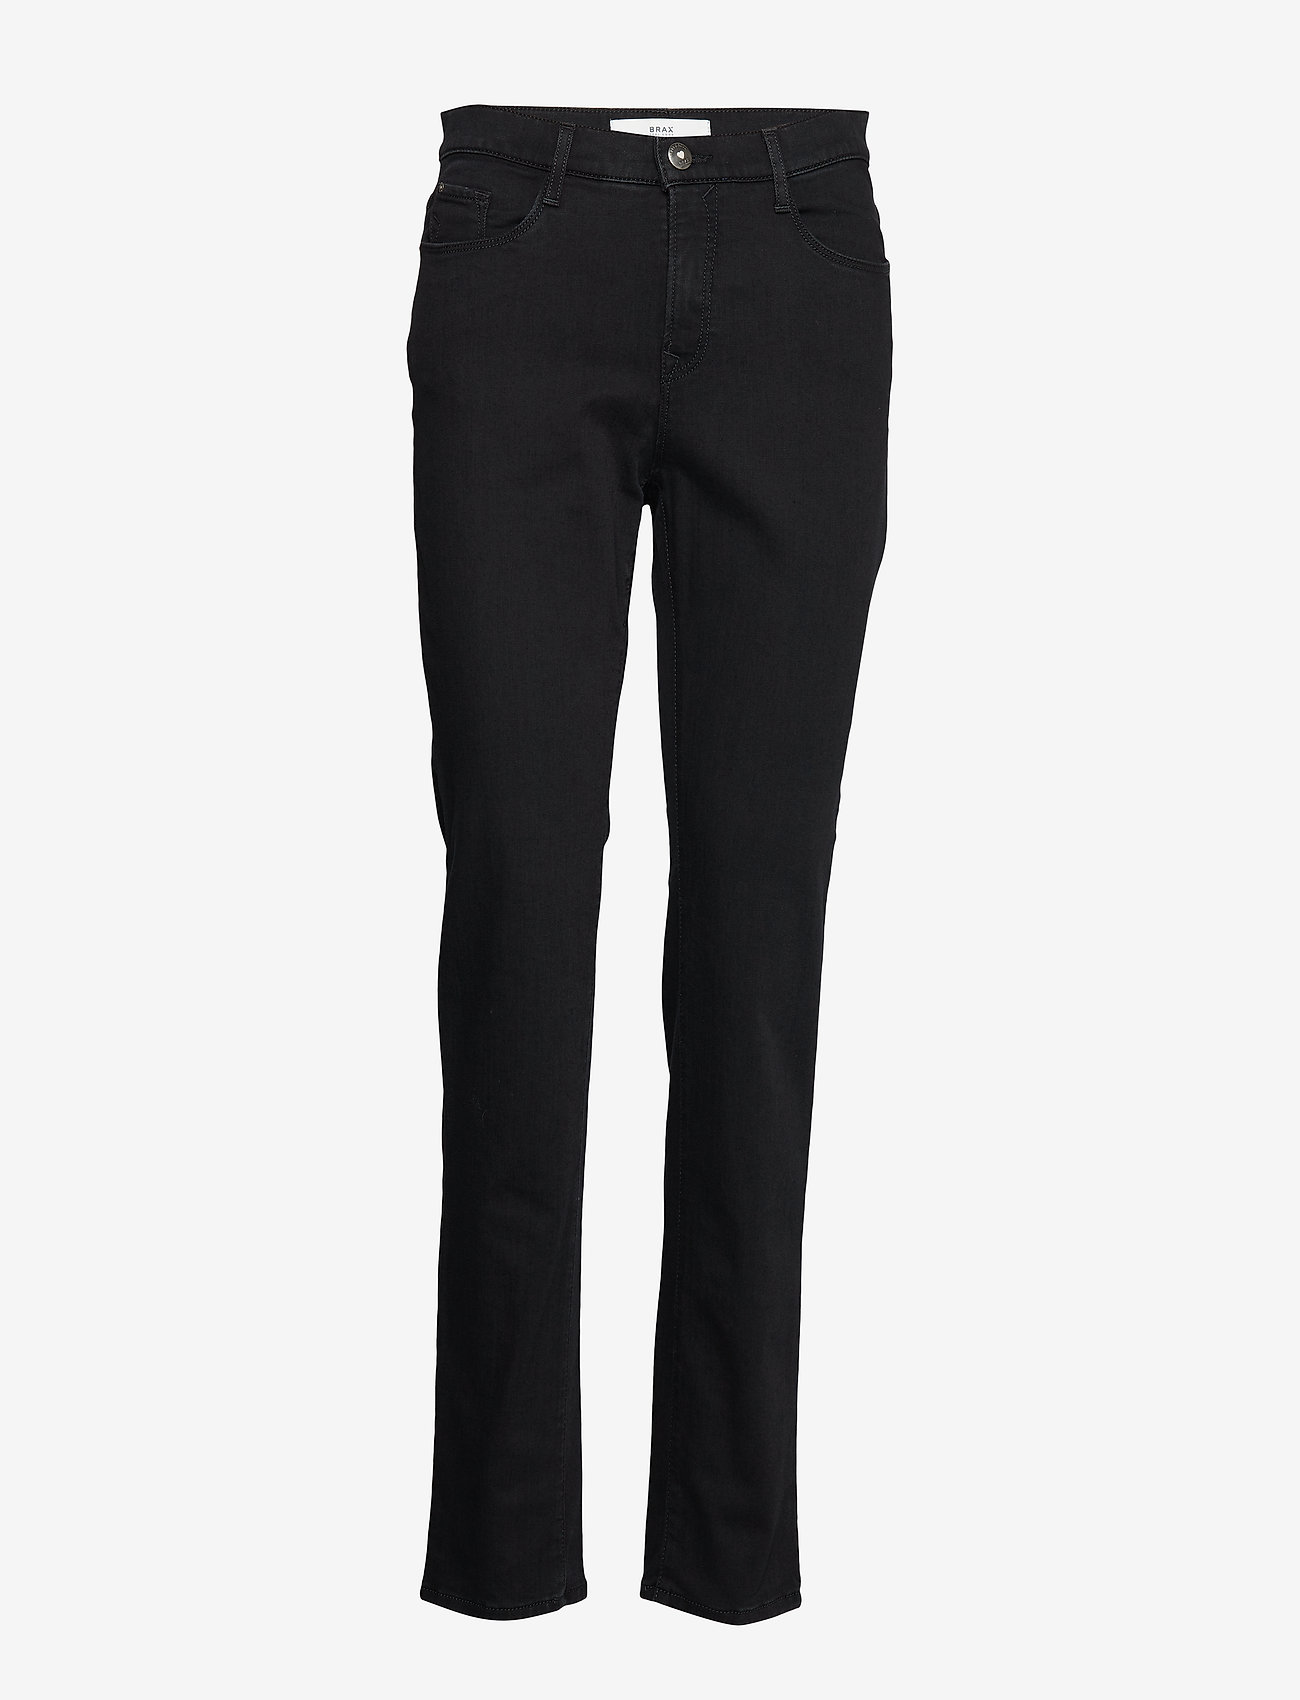 BRAX - MARY - slim jeans - clean black black - 0